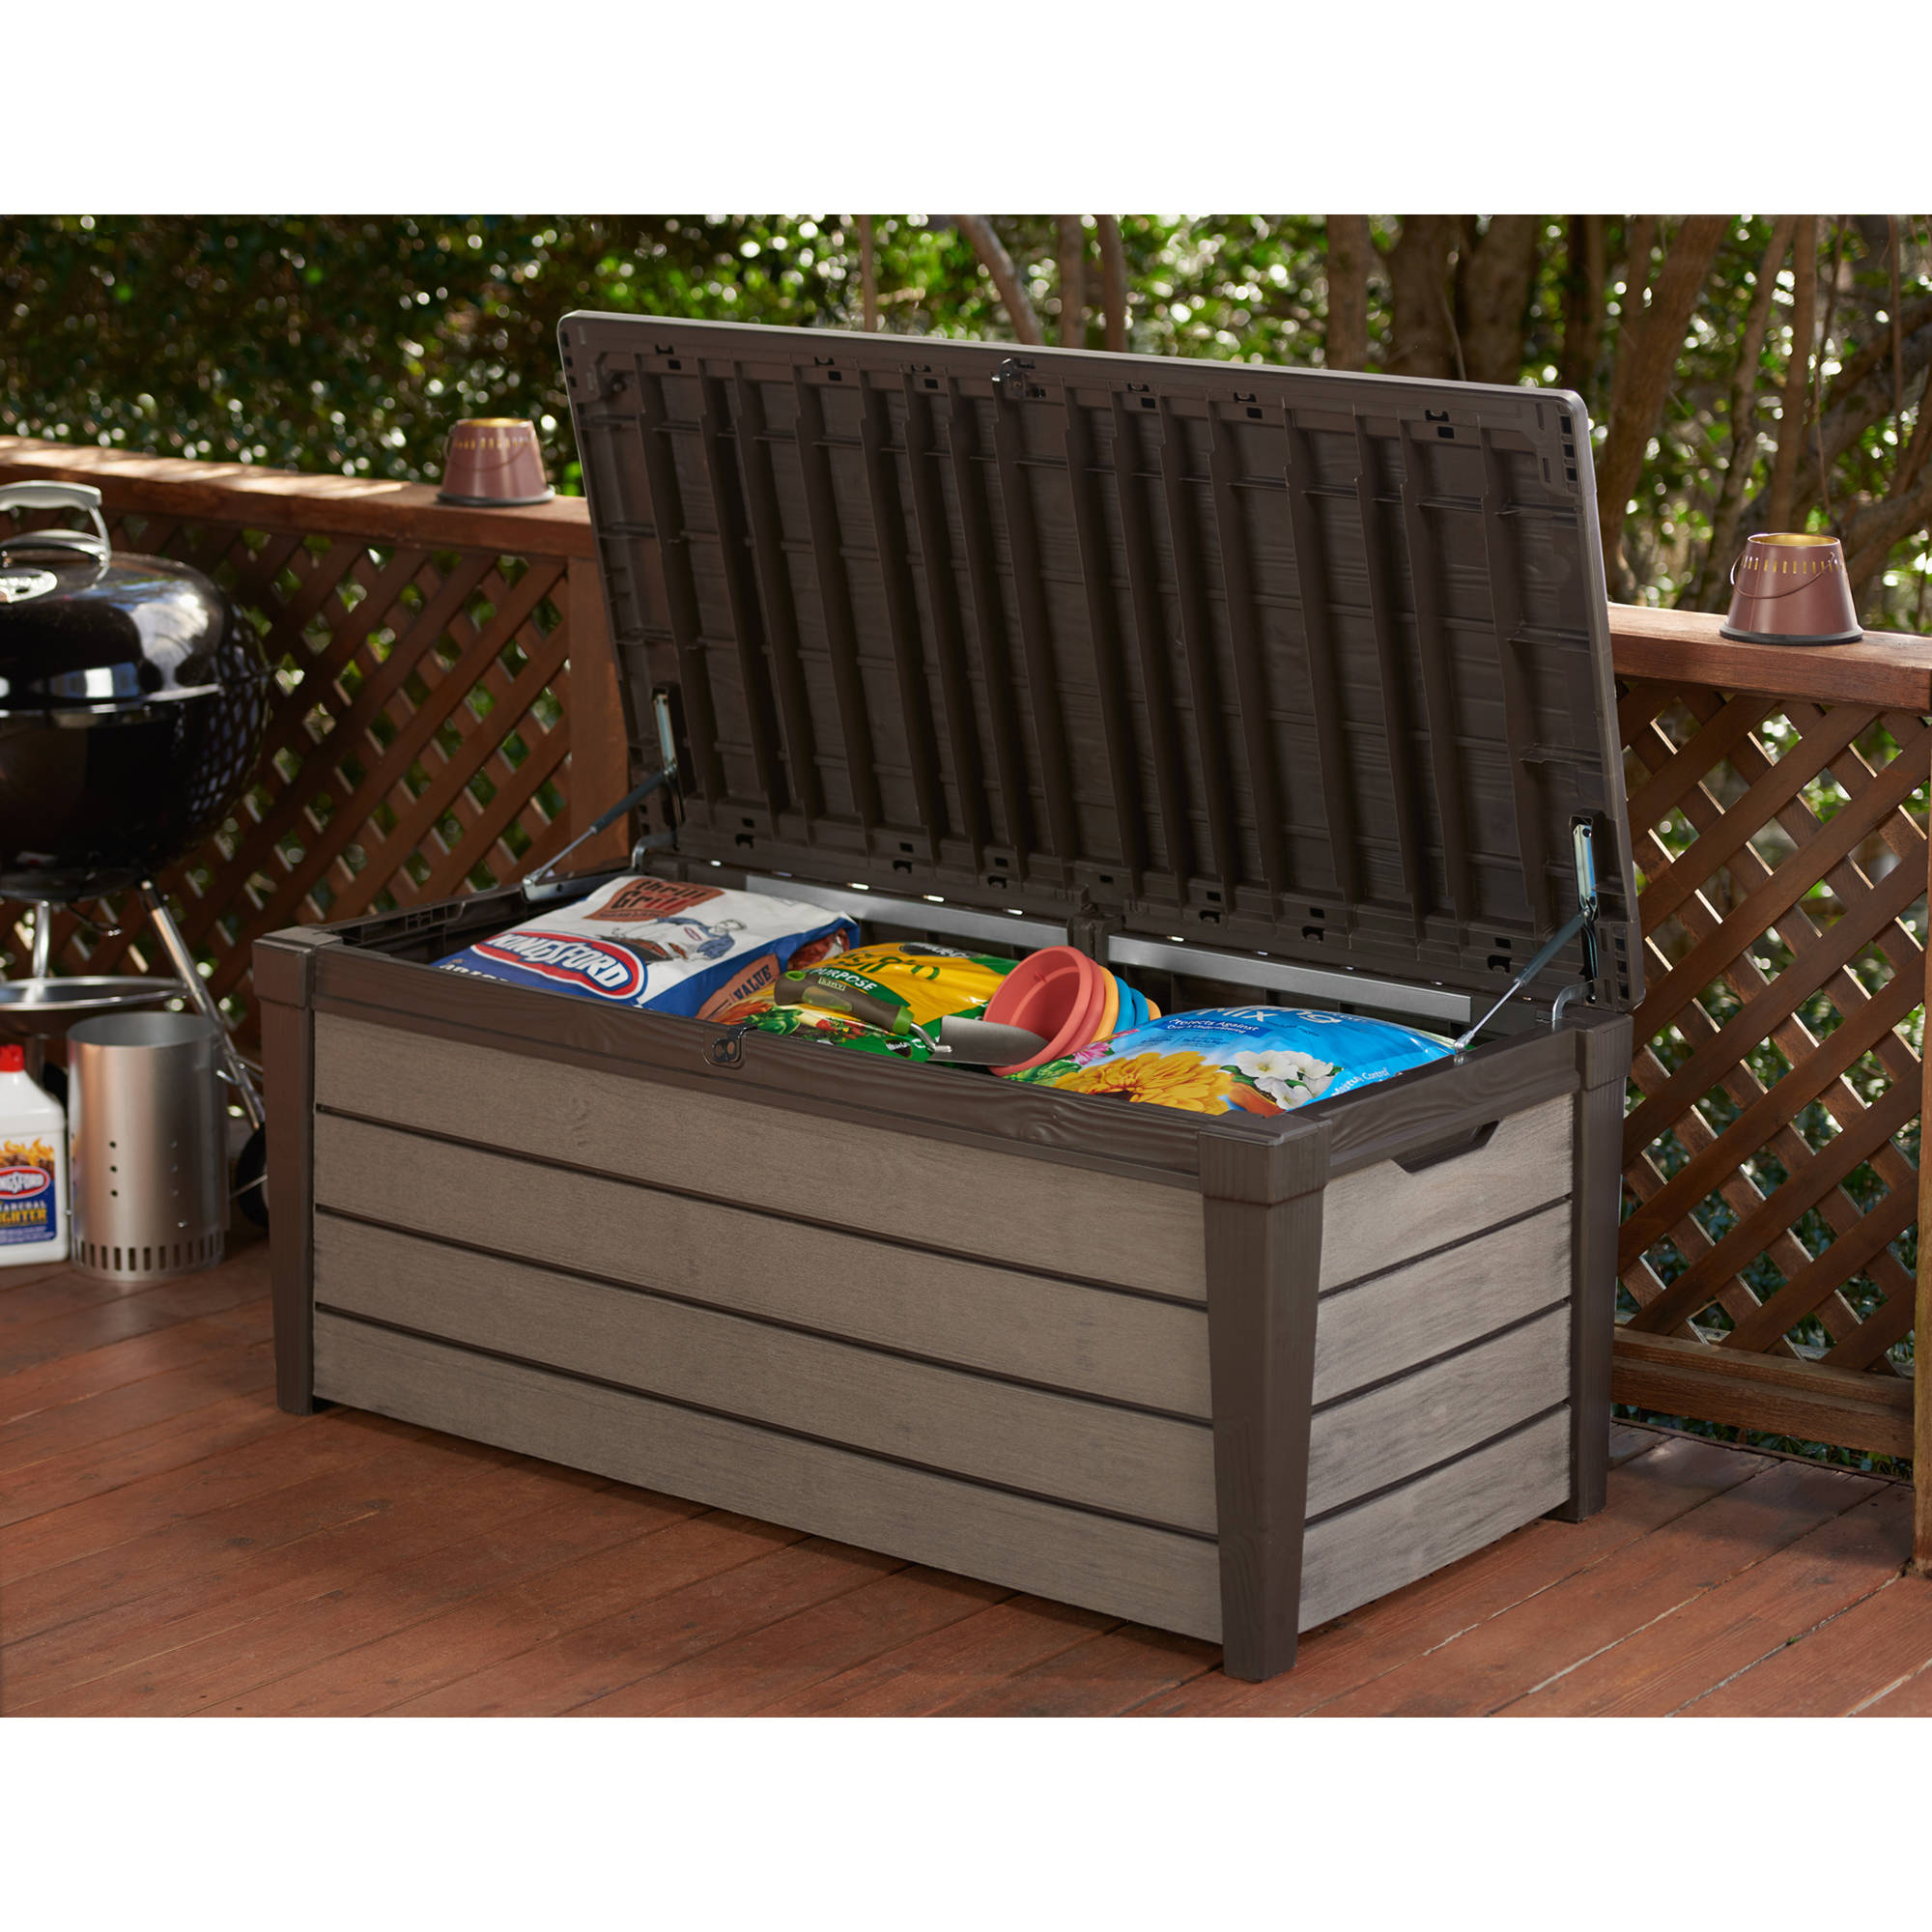 Patio Storage Bench Keter Patio Storage Bench Plastic Keter 150 Gallon Patio Storage